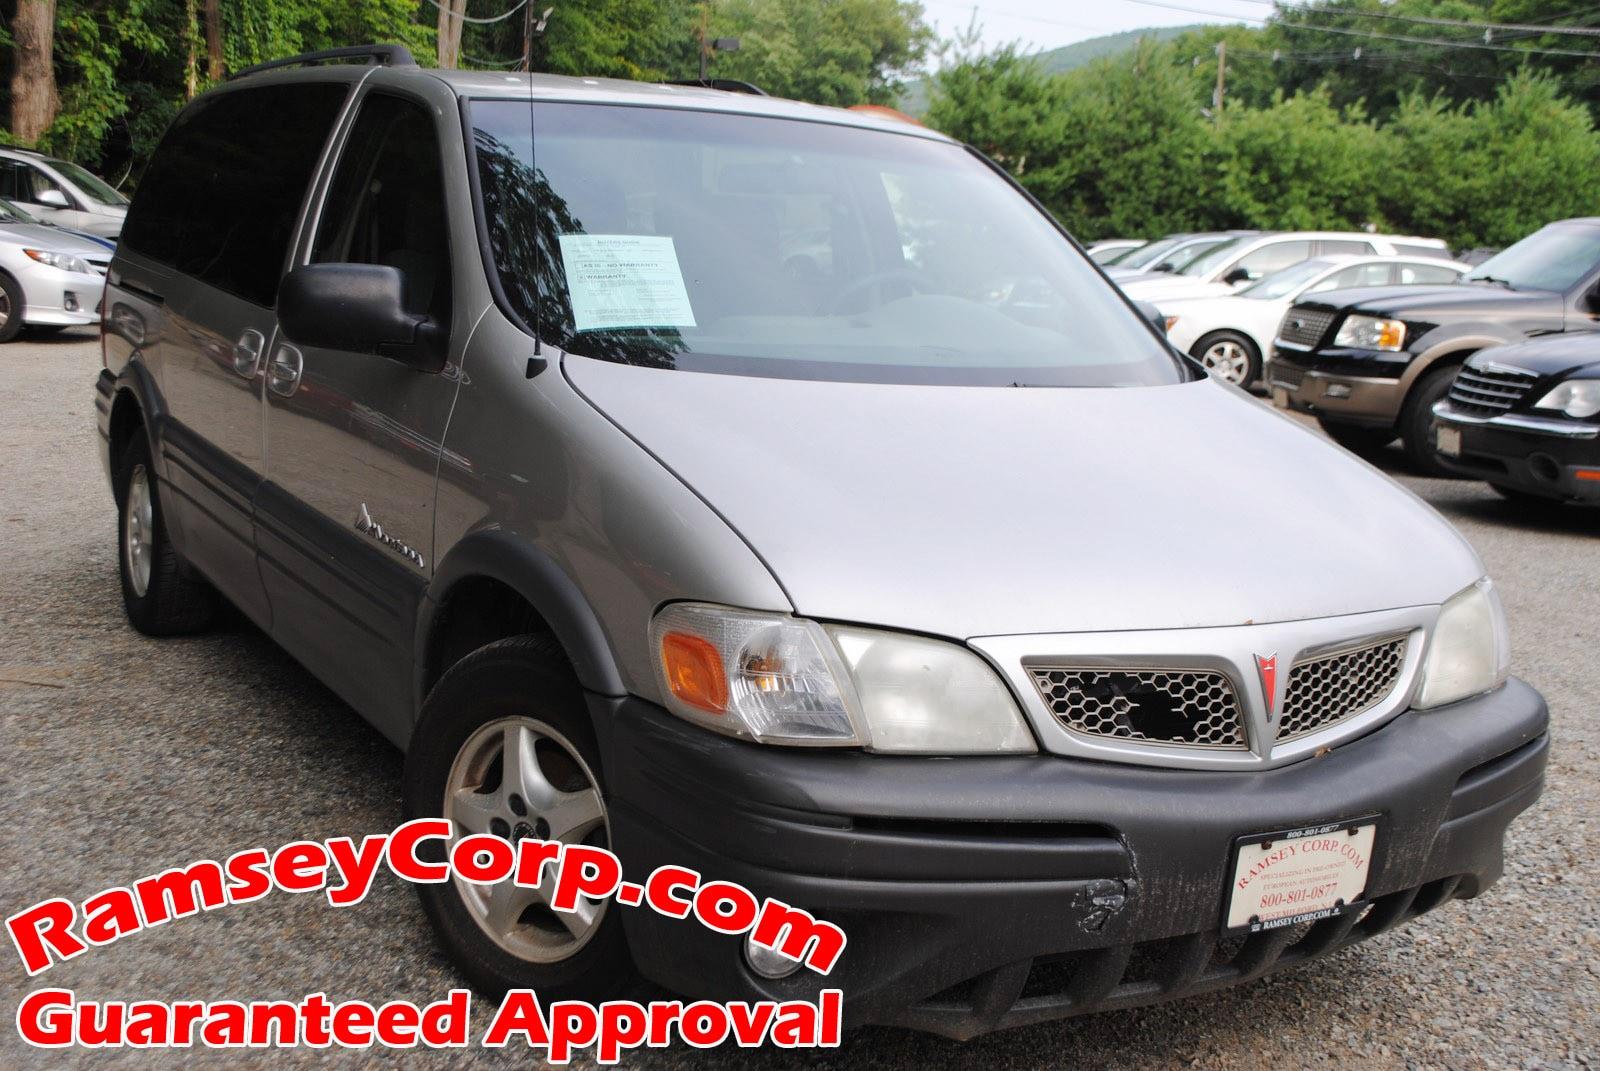 Used 2004 Pontiac Montana For Sale